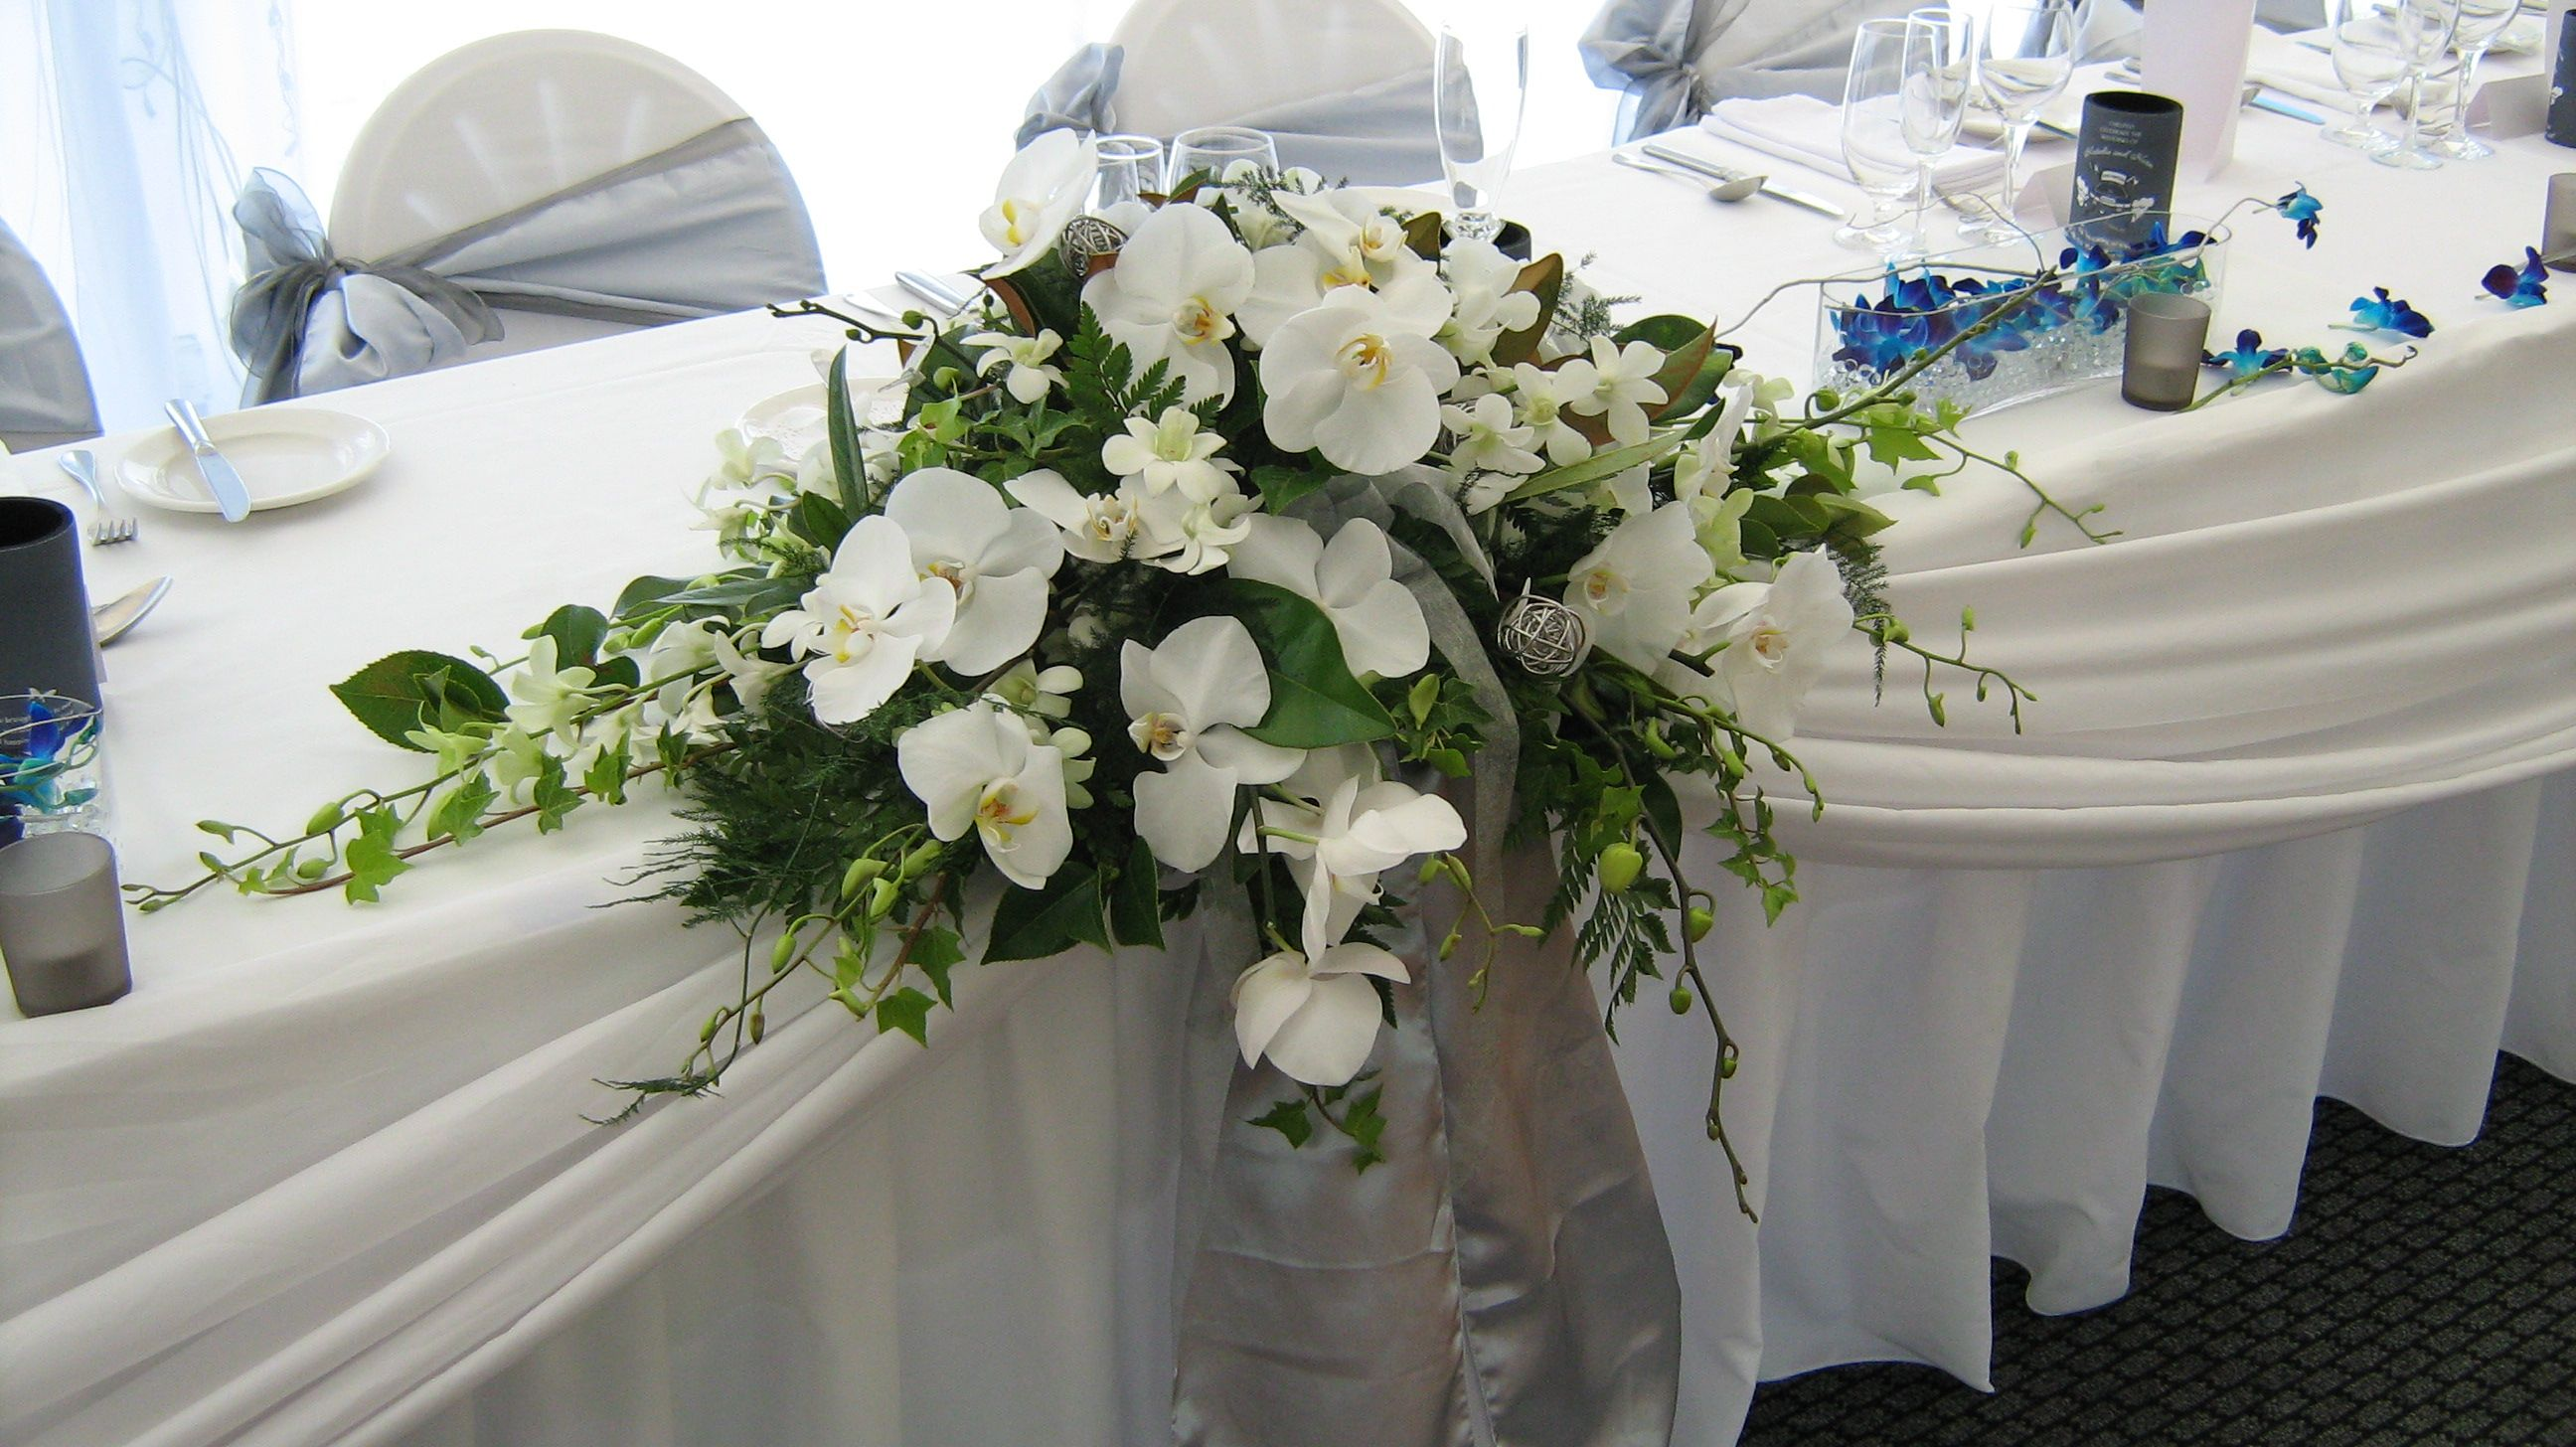 Wedding flower arrangements wedding table for Wedding table floral centerpieces